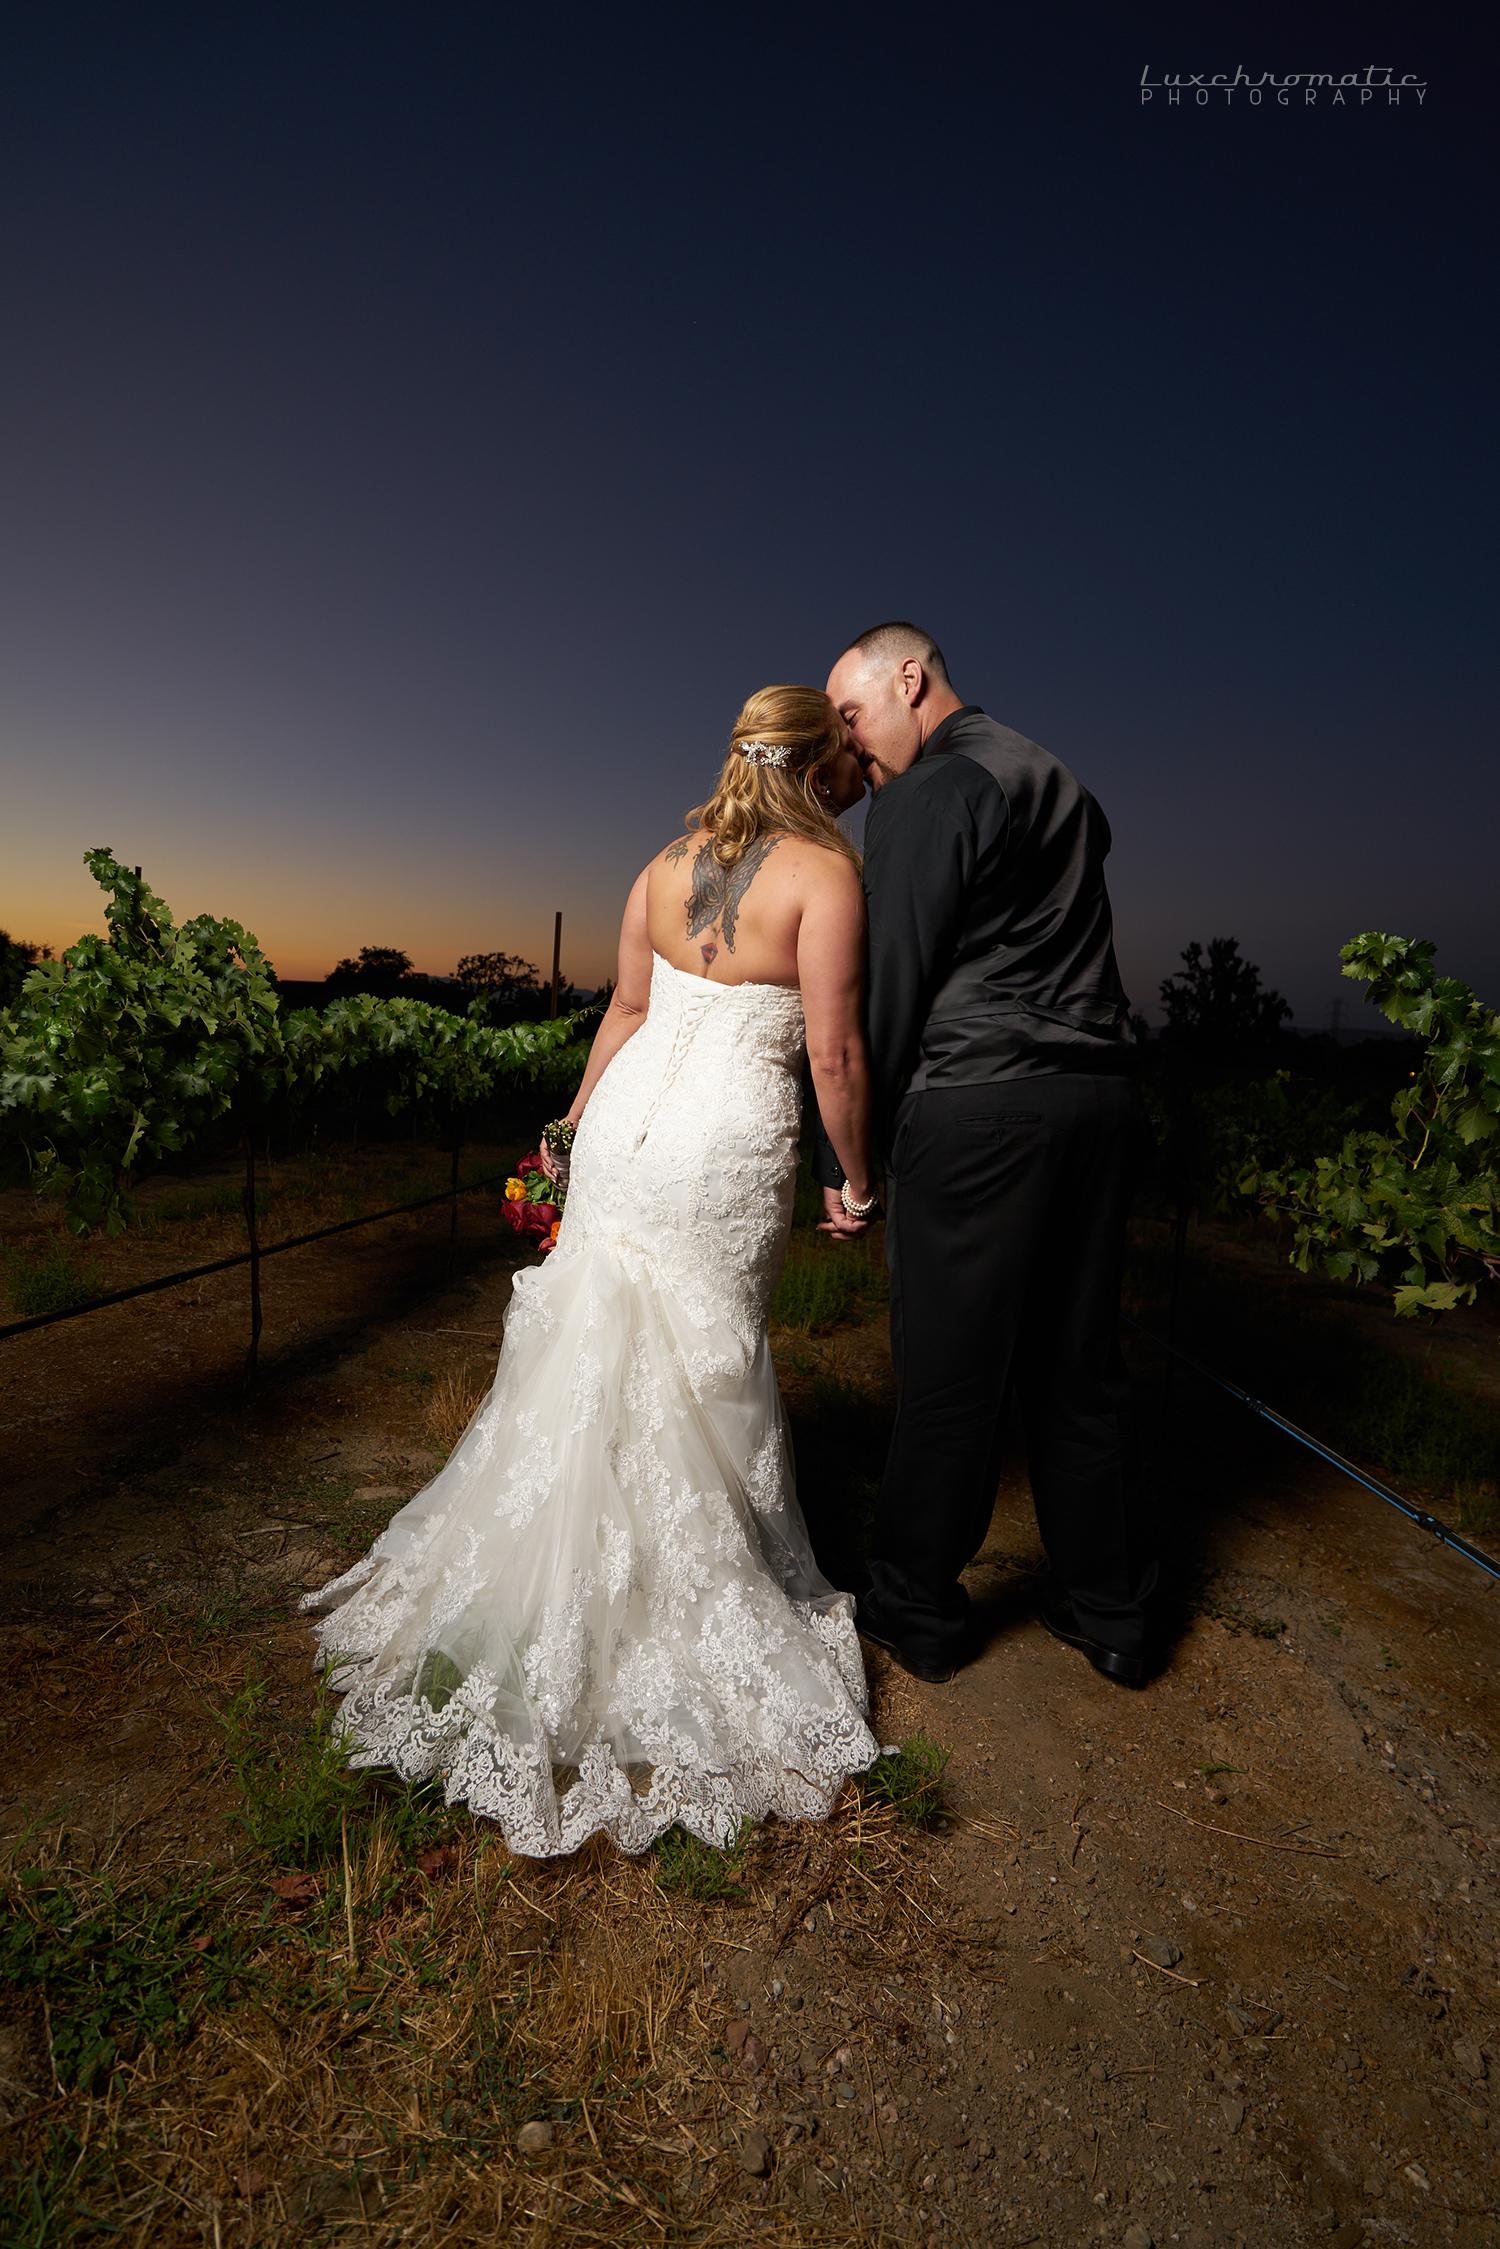 081217_Rachel_Chris_a0747-weddingdress-bride-weddingphotography-weddingphotographer-bridal-groom-wedding-engagementring-proposal-brides-diamondring-sonyalpha-sony-sonya9-sonya7rii-sanfrancisco-sf-bayarea-photographer-profoto-murrietas-well.jpg